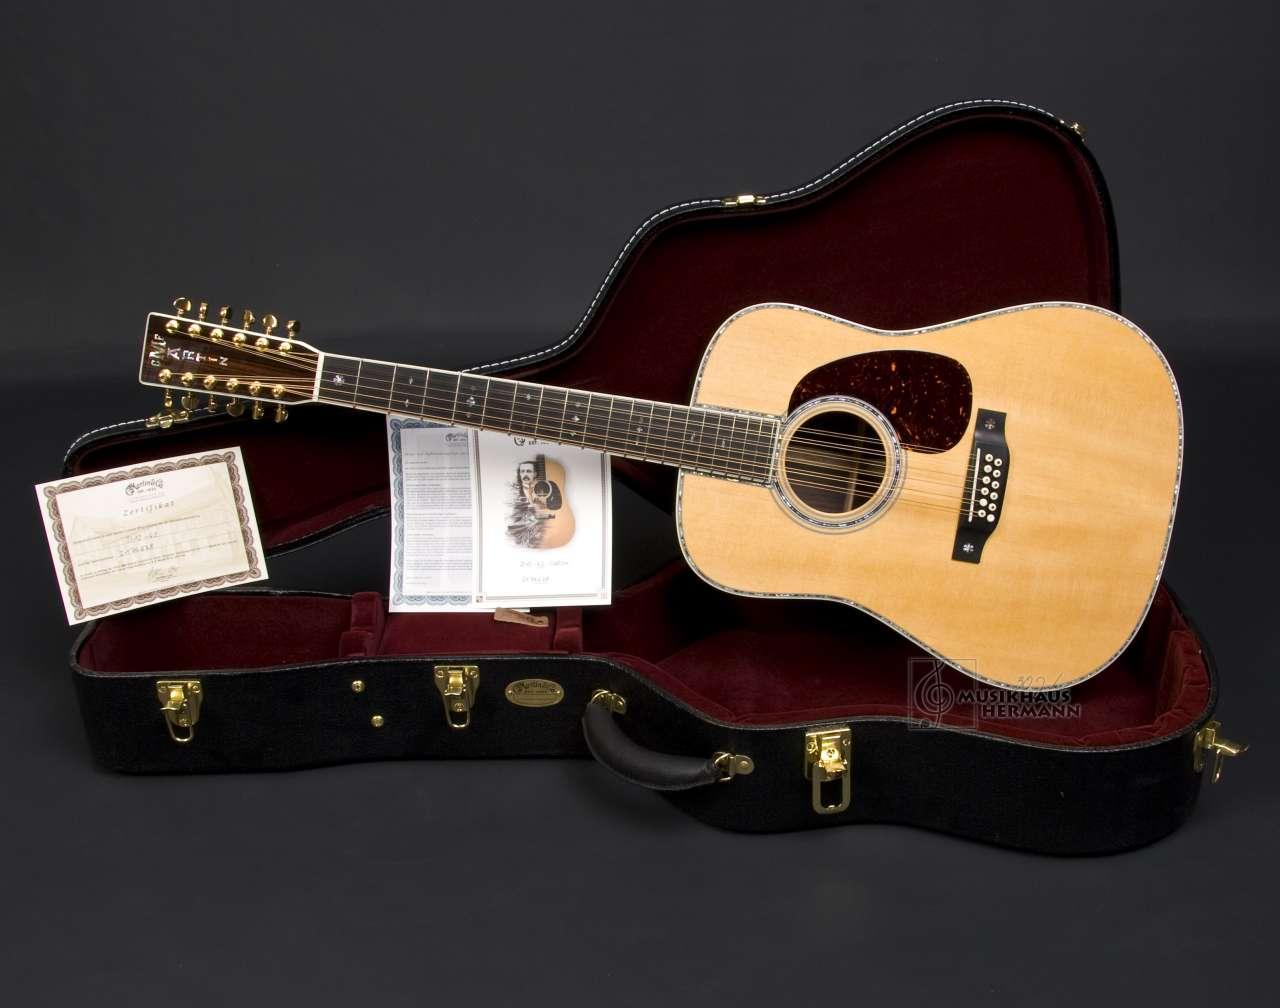 Martin D12-42 Cocobolo Custom - 12-String